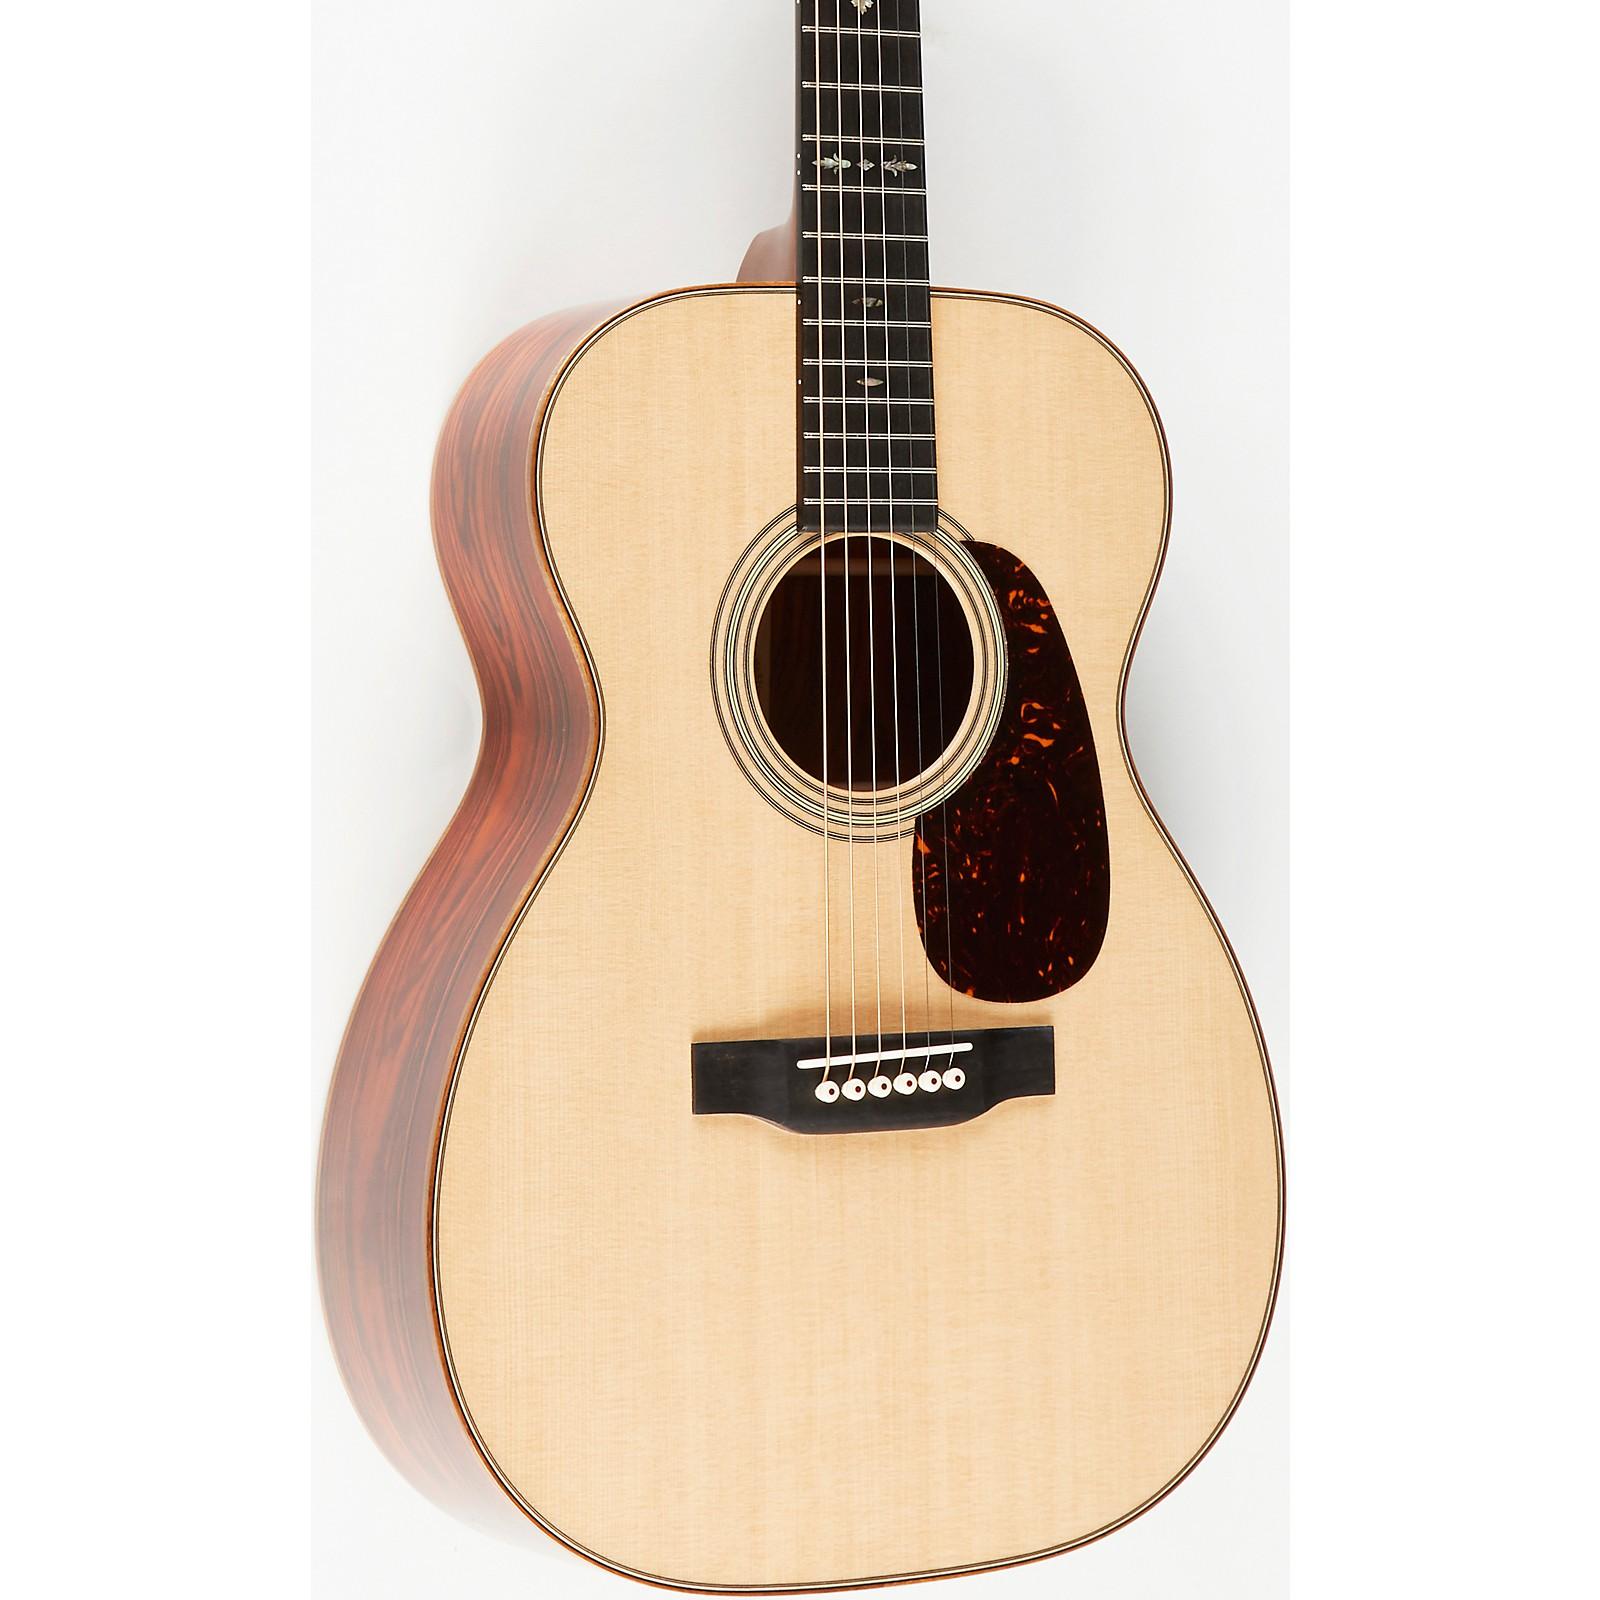 Martin Custom Grand Concert Cocobolo Deluxe Acoustic Guitar